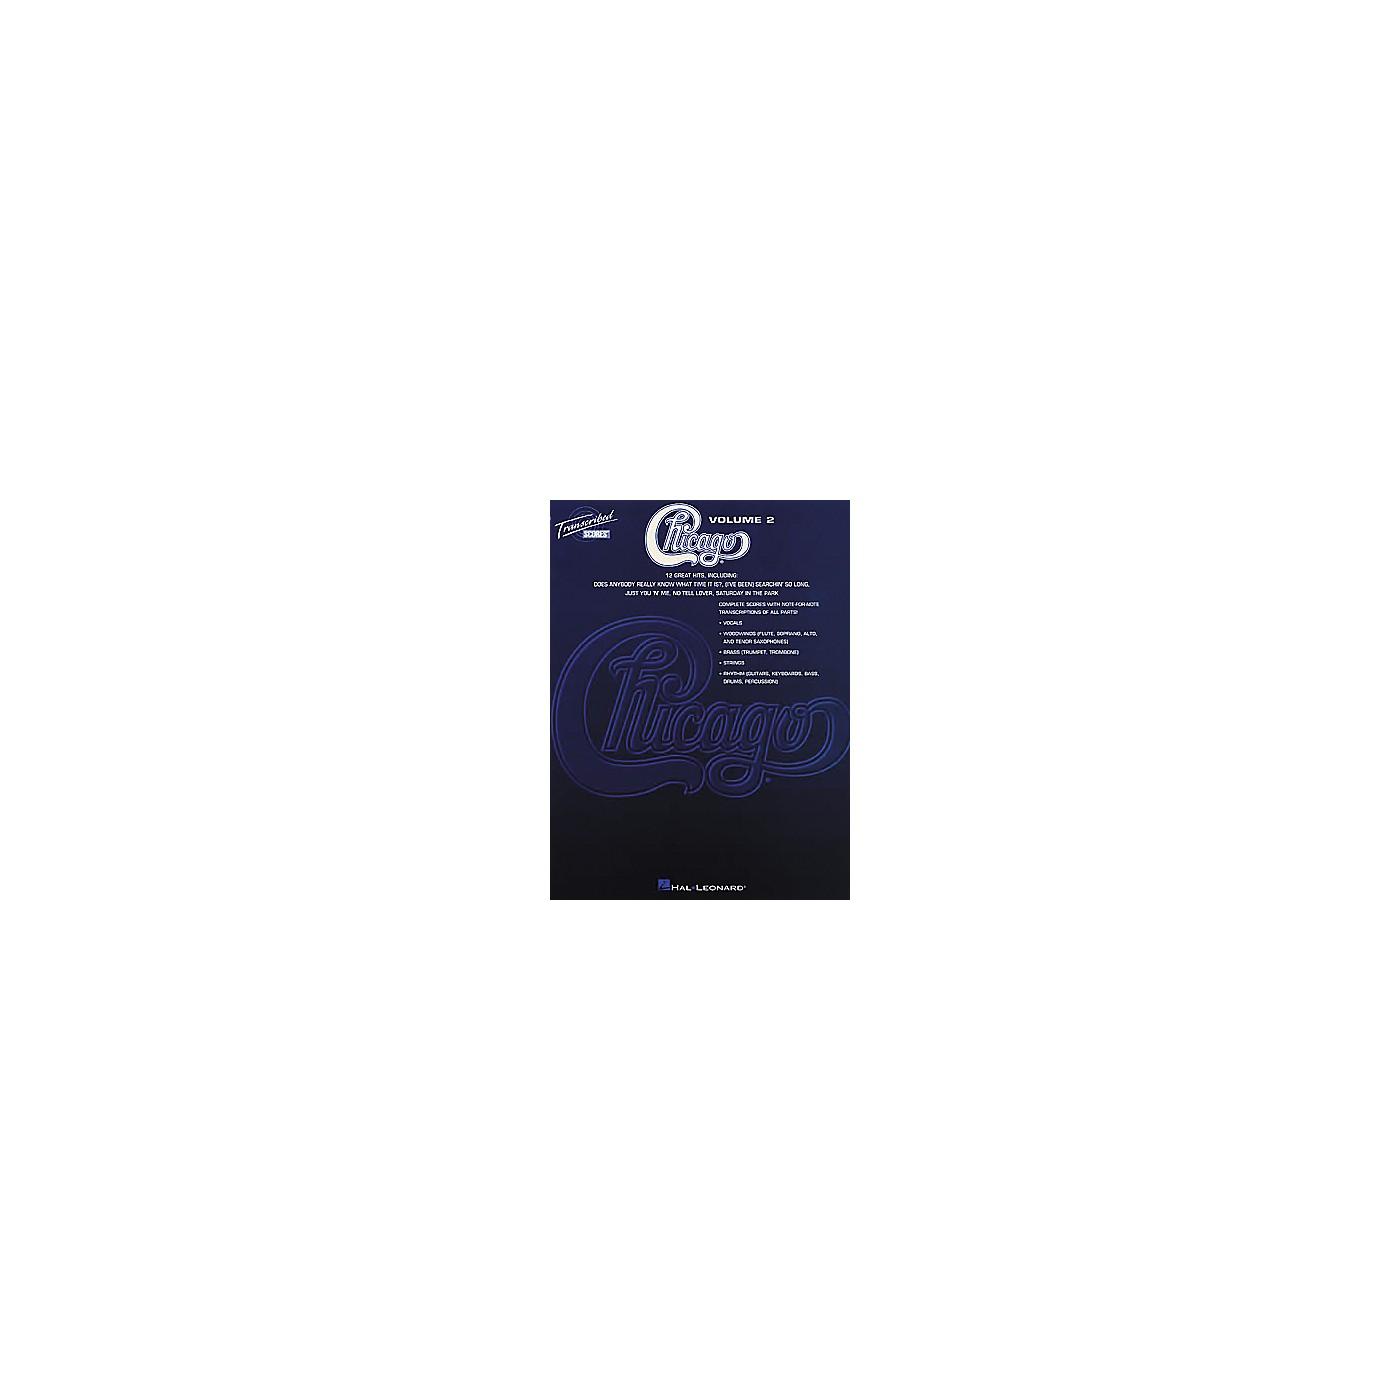 Hal Leonard Chicago - Volume 2 Book thumbnail